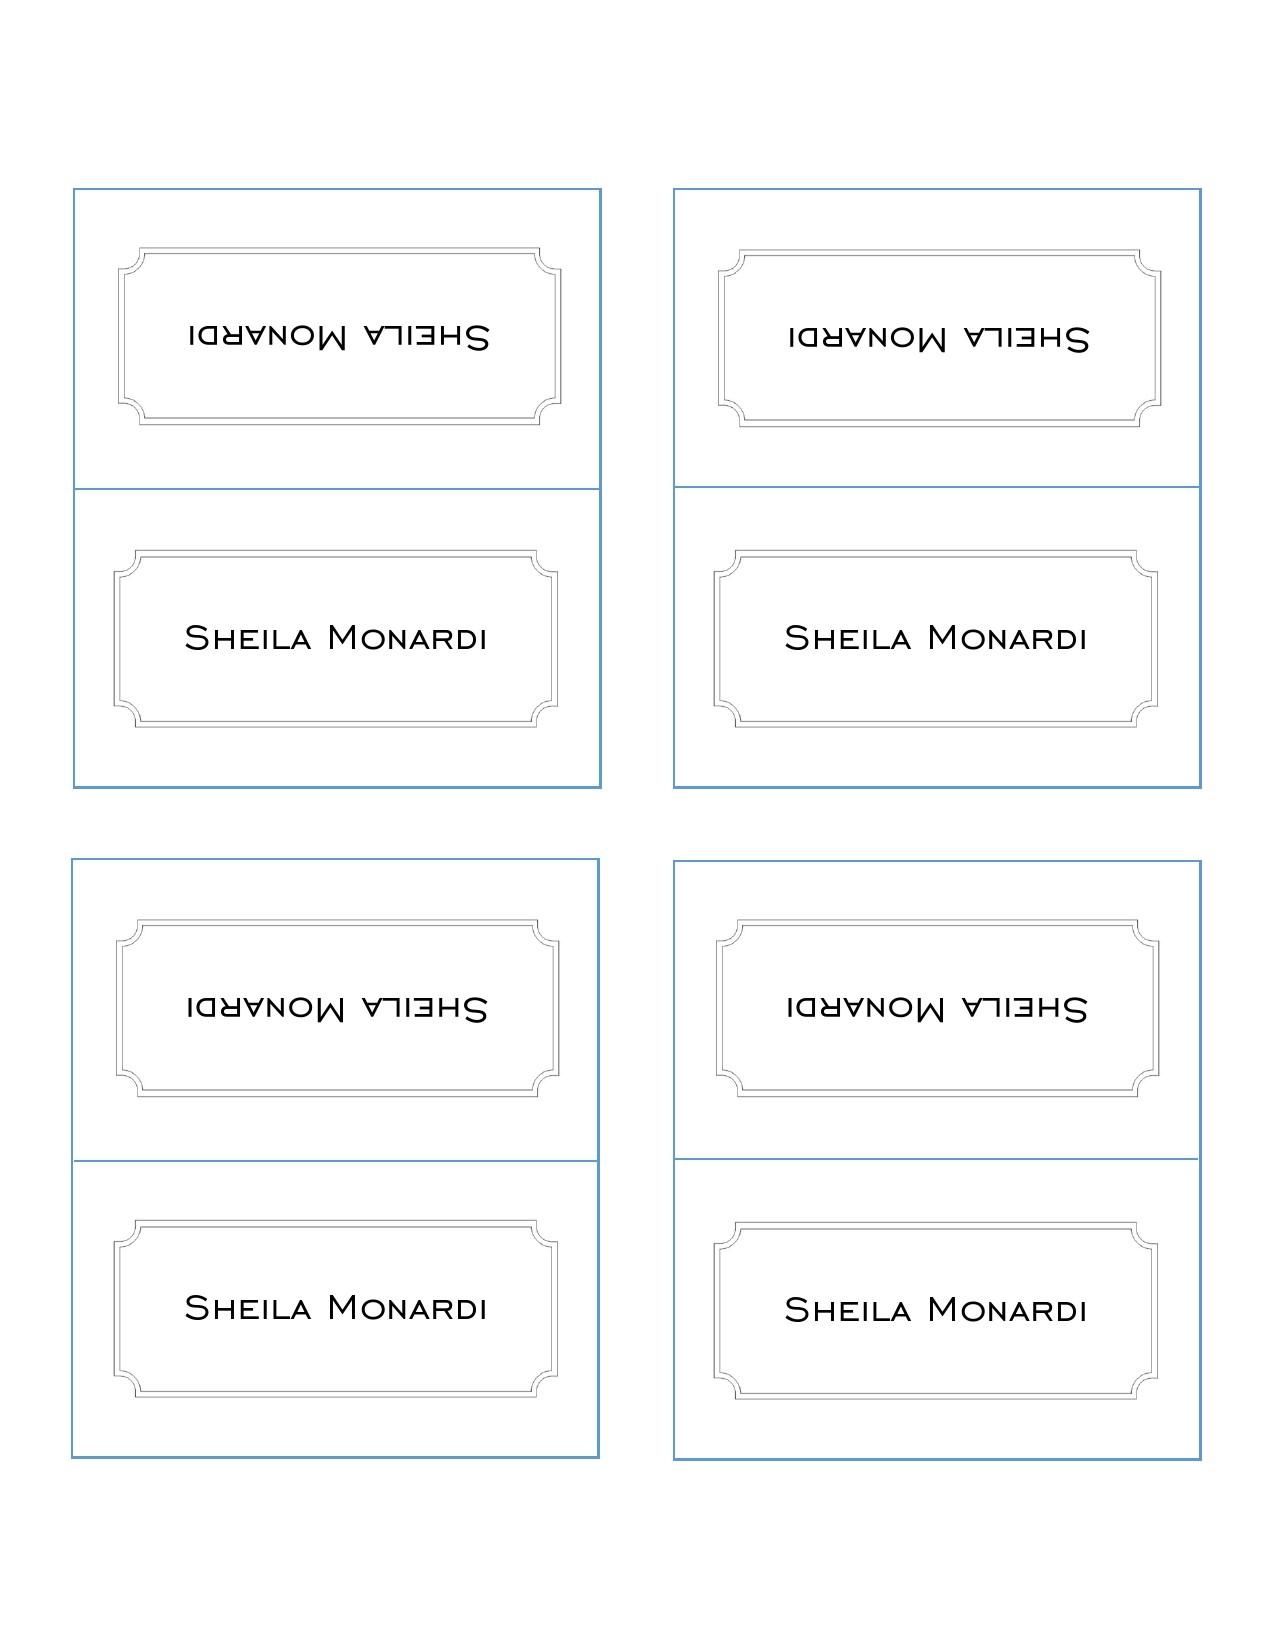 15 Printable Place Card Templates (Free) ᐅ TemplateLab